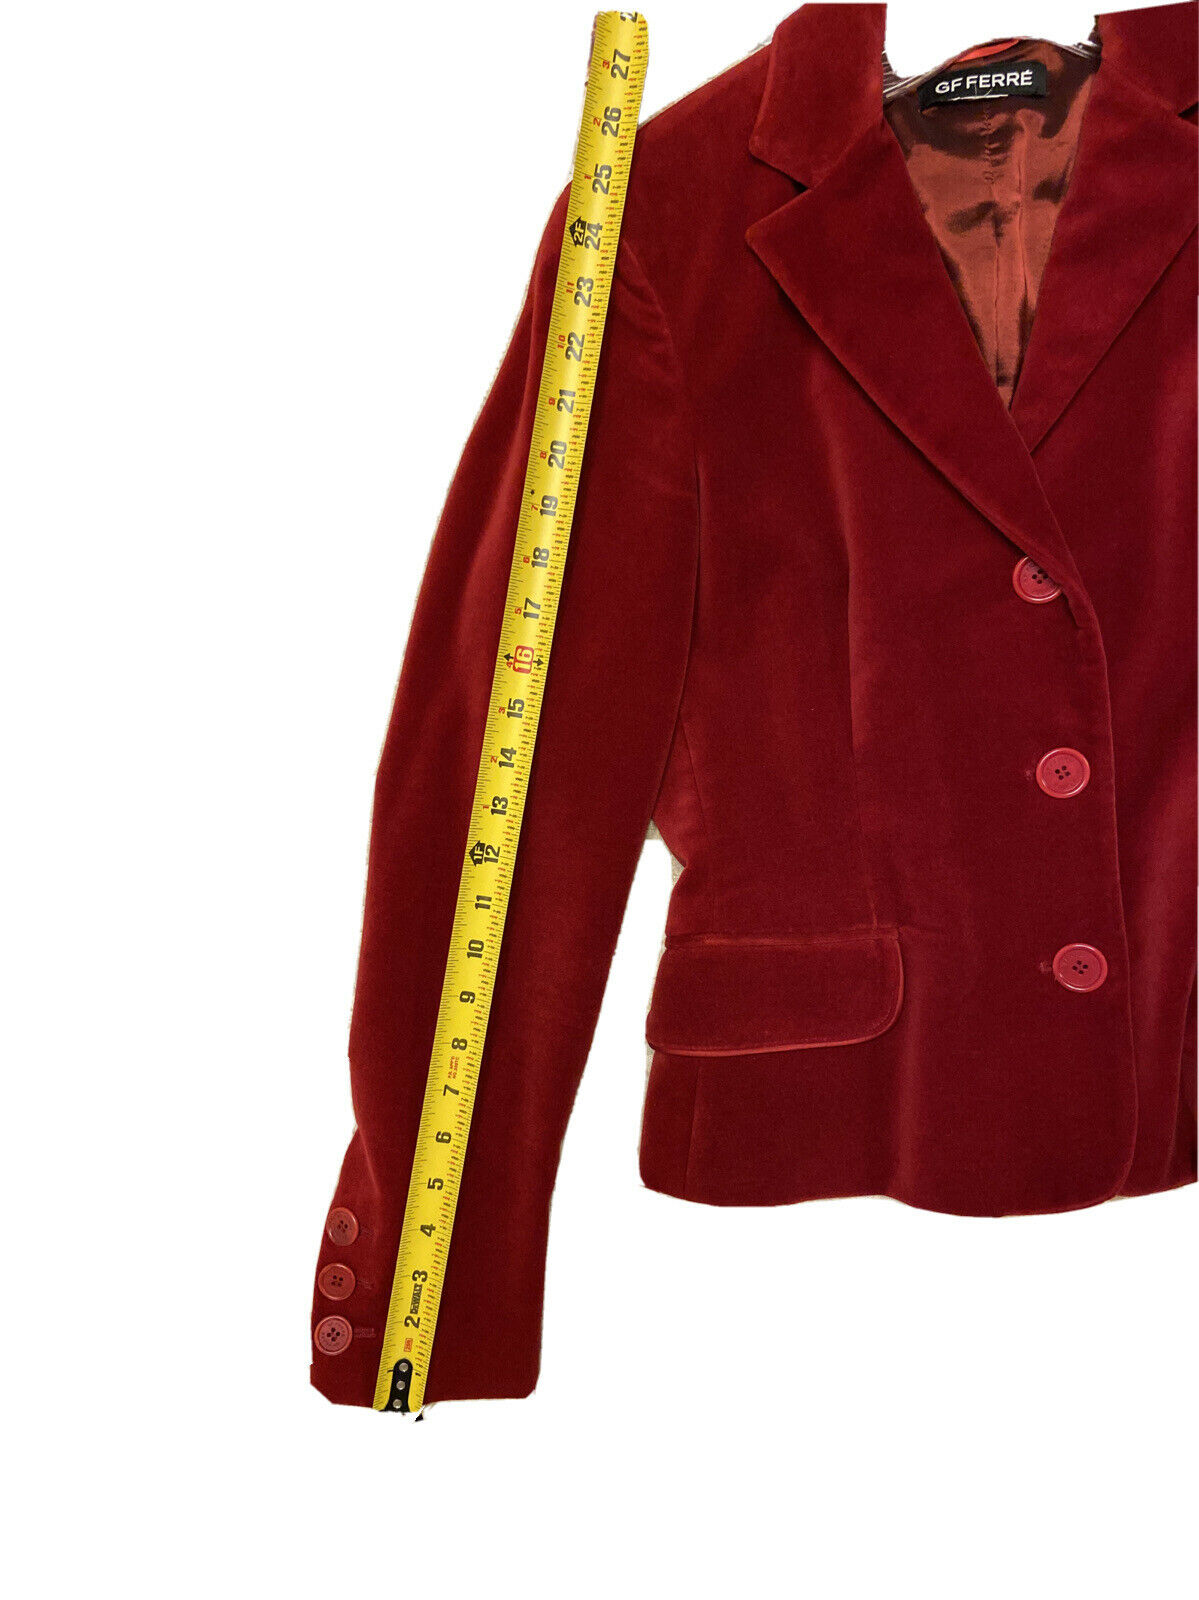 GF FERRE Vintage Red Velvet Velour Jacket Blazer … - image 9